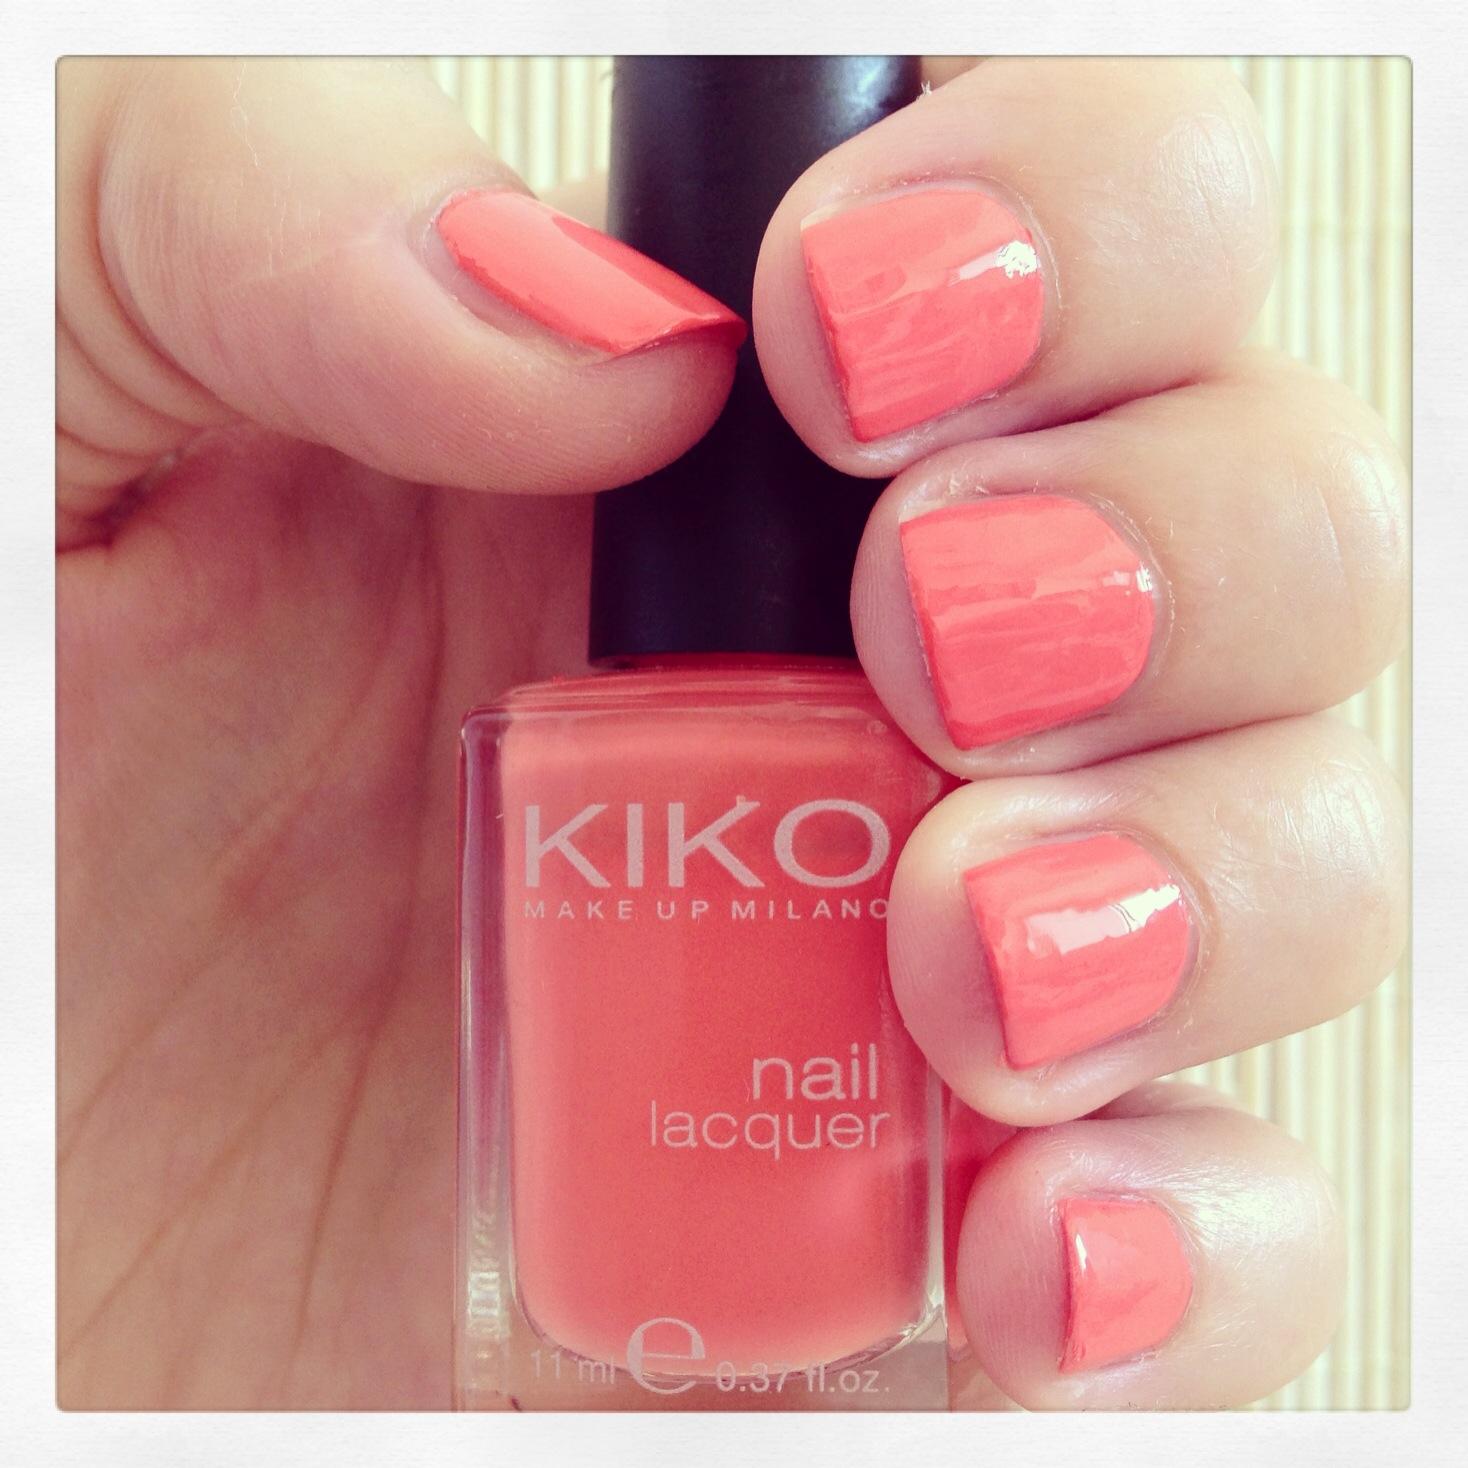 Manicura Detox #4 - Kiko 358 - Coral suave, ni pastel ni neón - Clon del Tart Deco de Essie